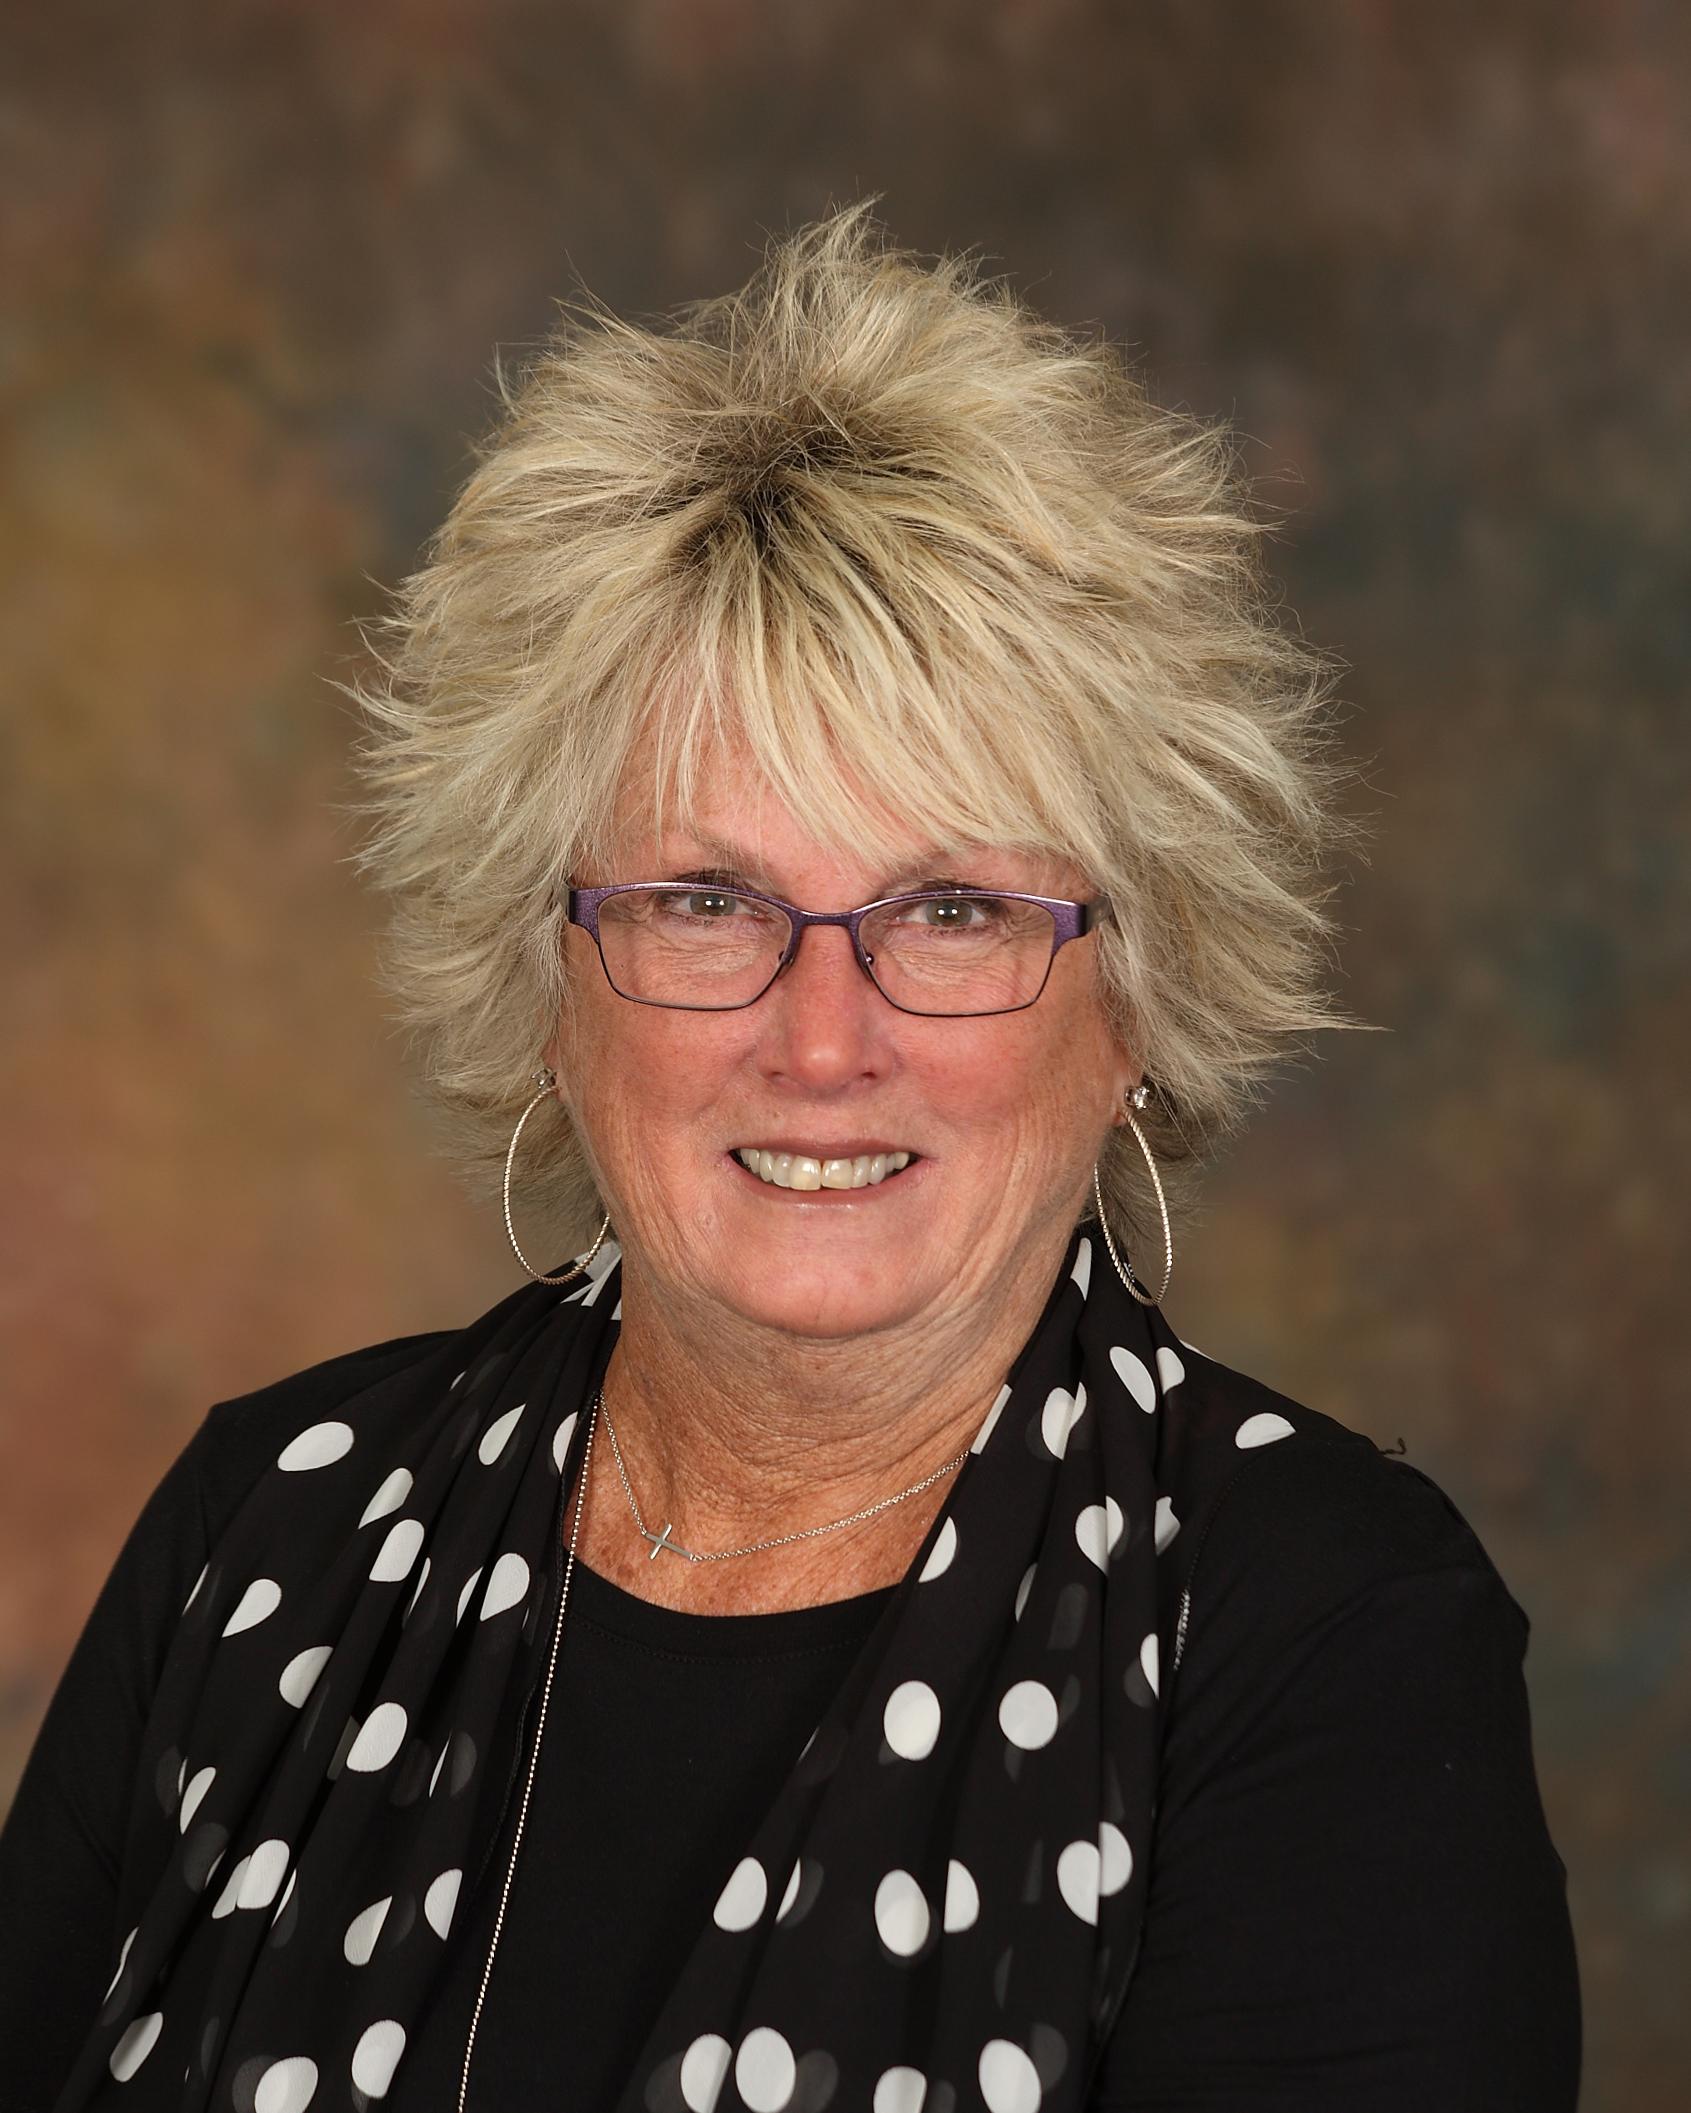 Pam Hearne